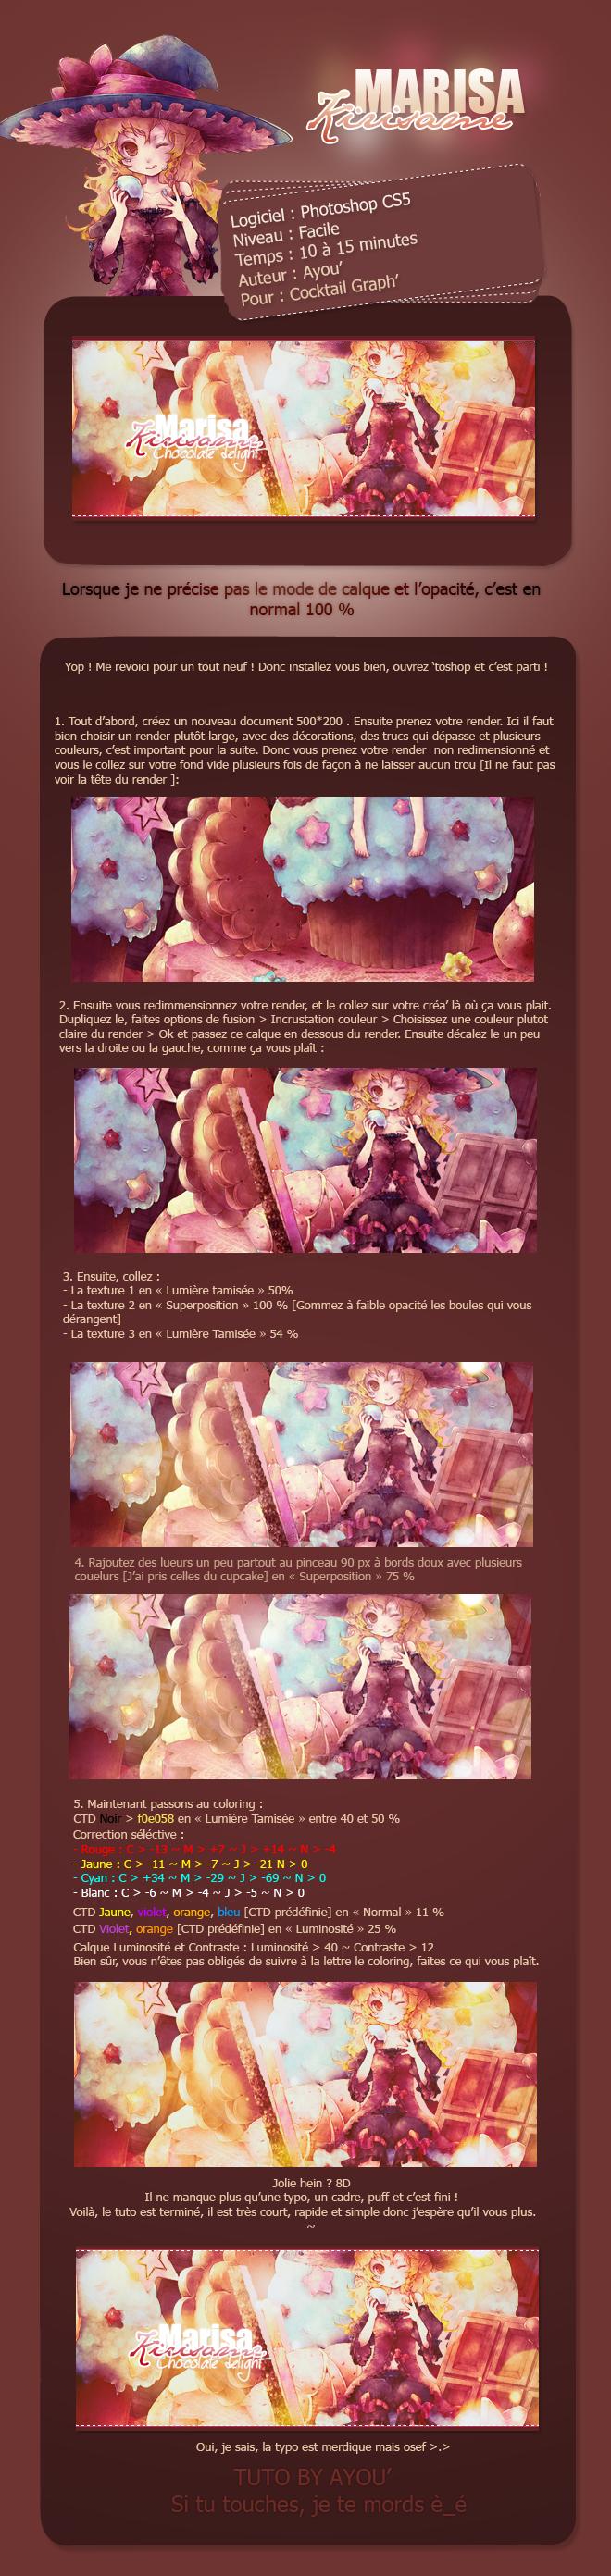 Signature Marisa Kirisame ~ Chocolate Delight [Facile ~ 5 rendus] Marisakirisame-3725e2e